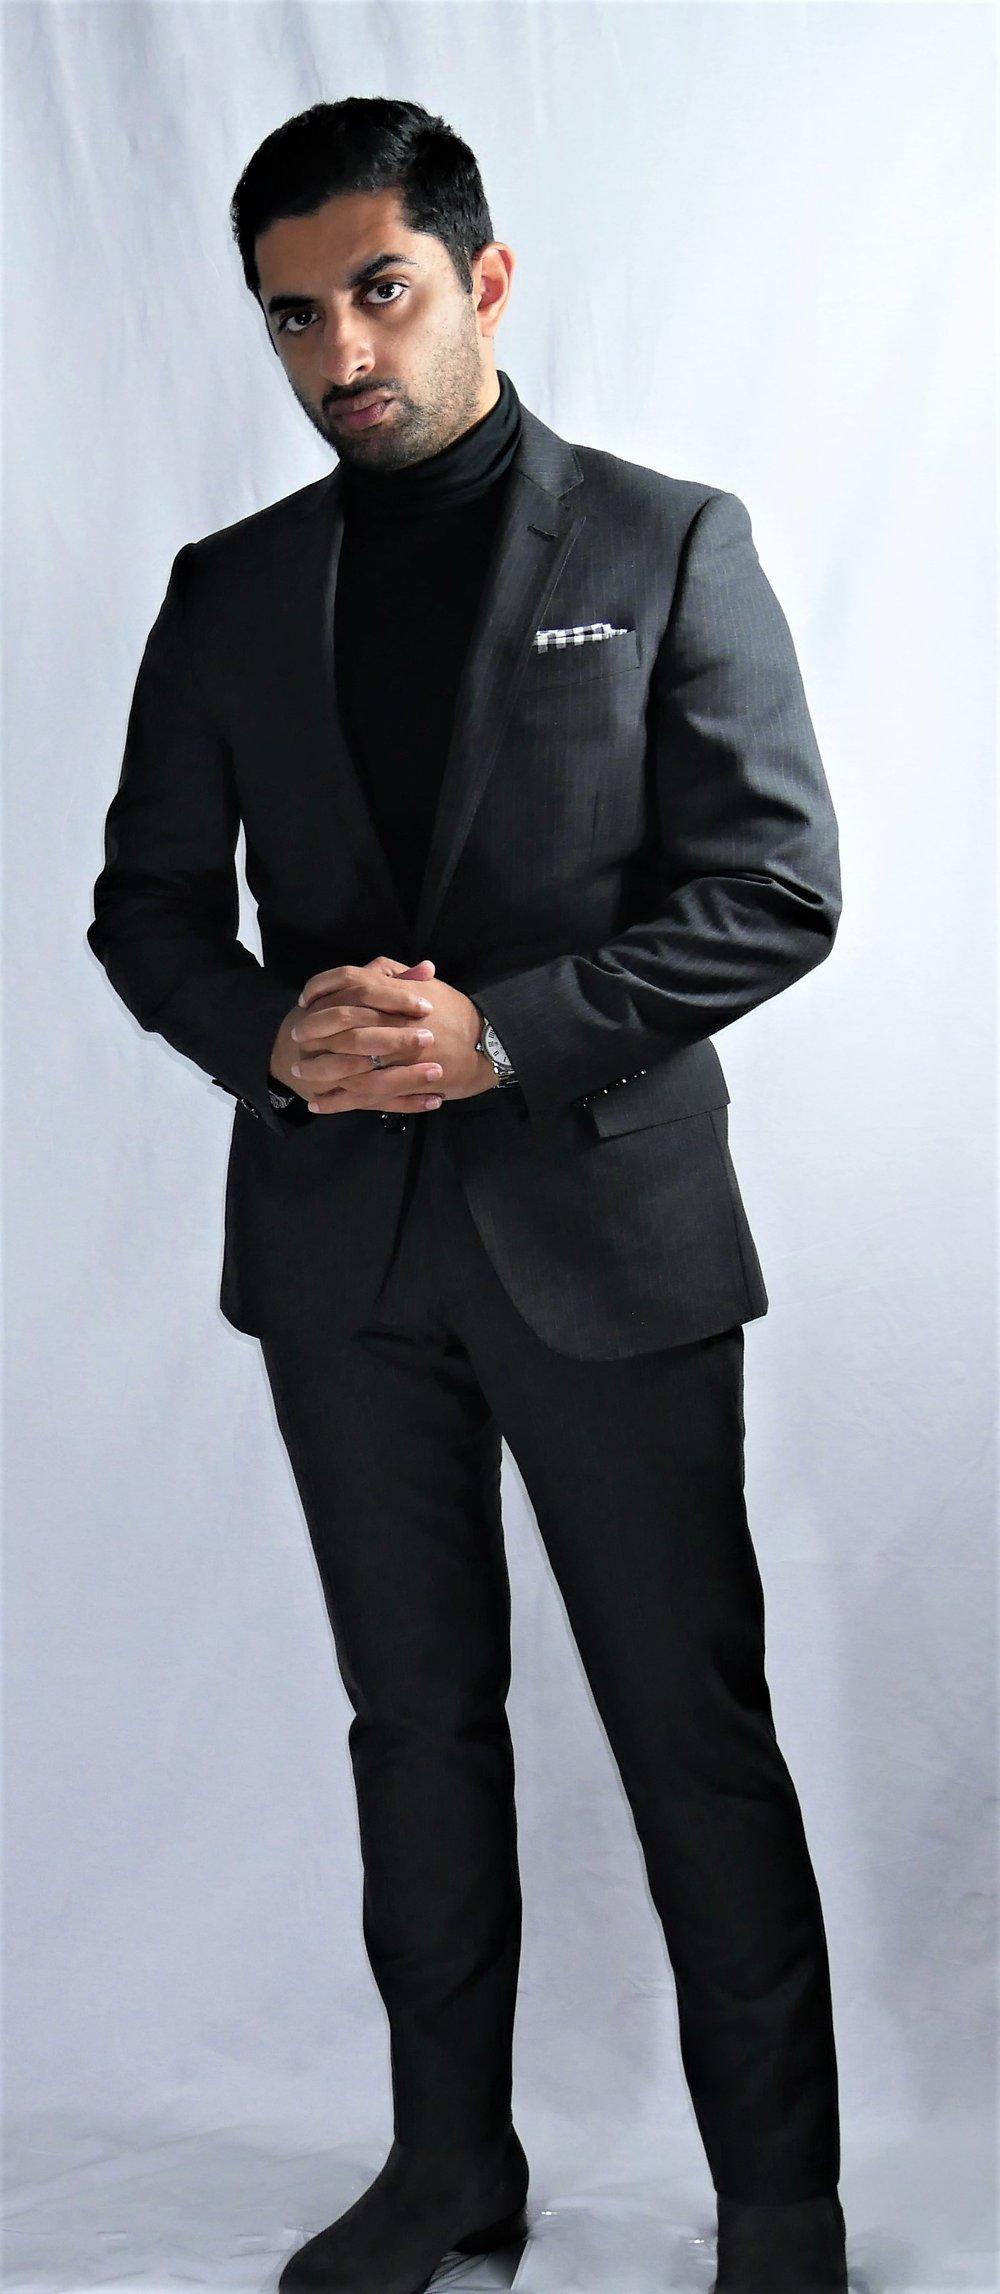 I could so be a James Bond villain. Or James Bond.